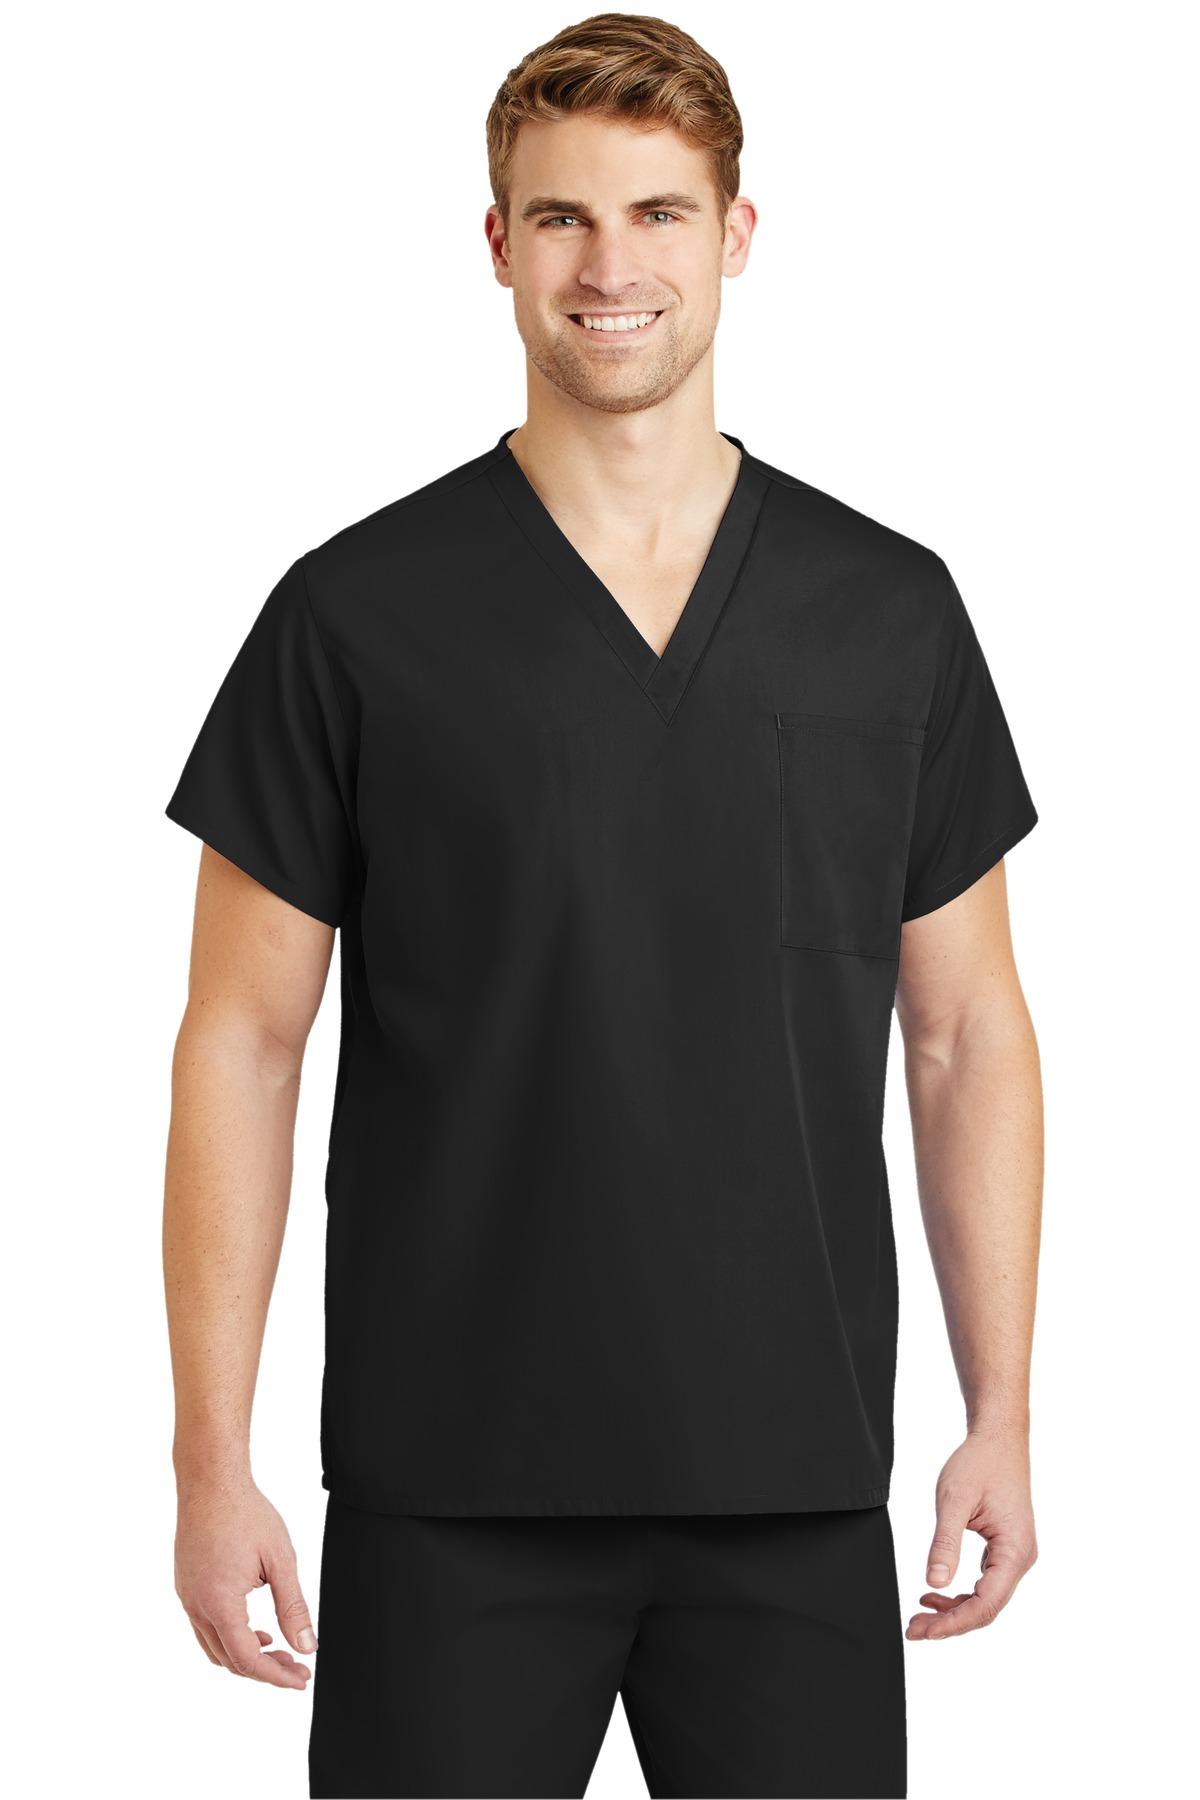 Medical/Scrubs